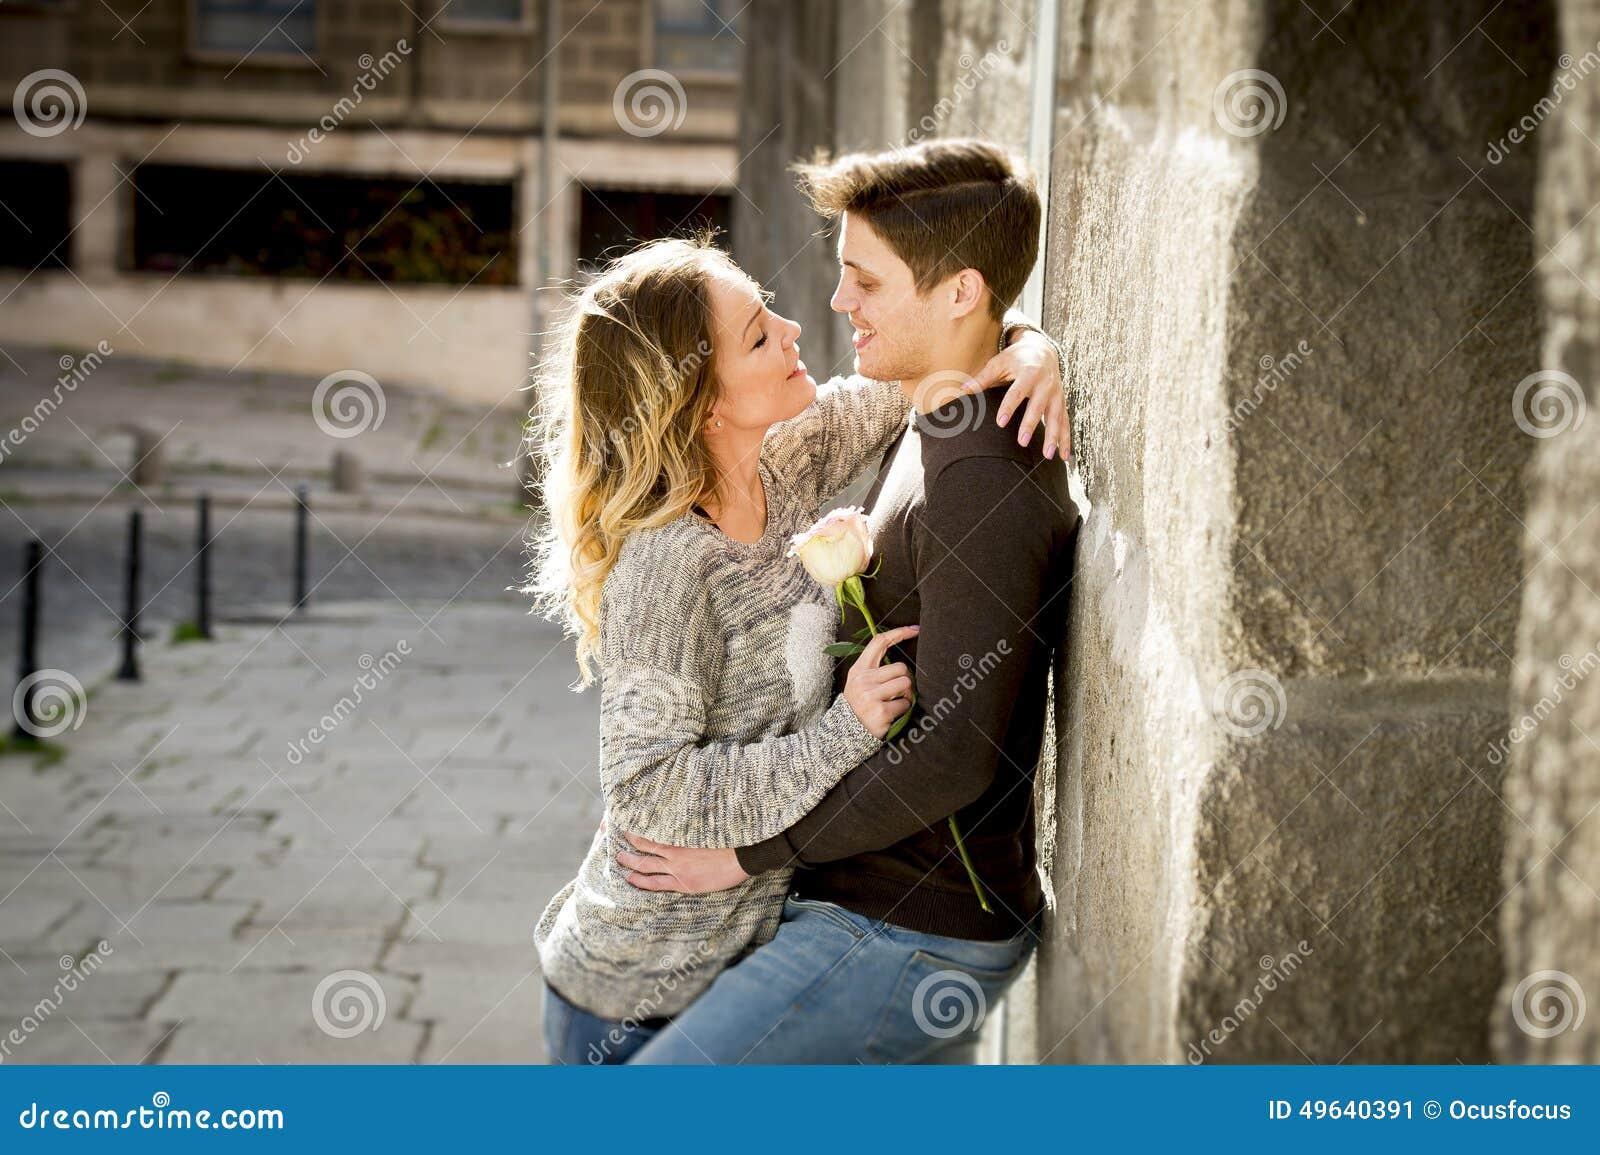 Candid teen kiss — photo 10